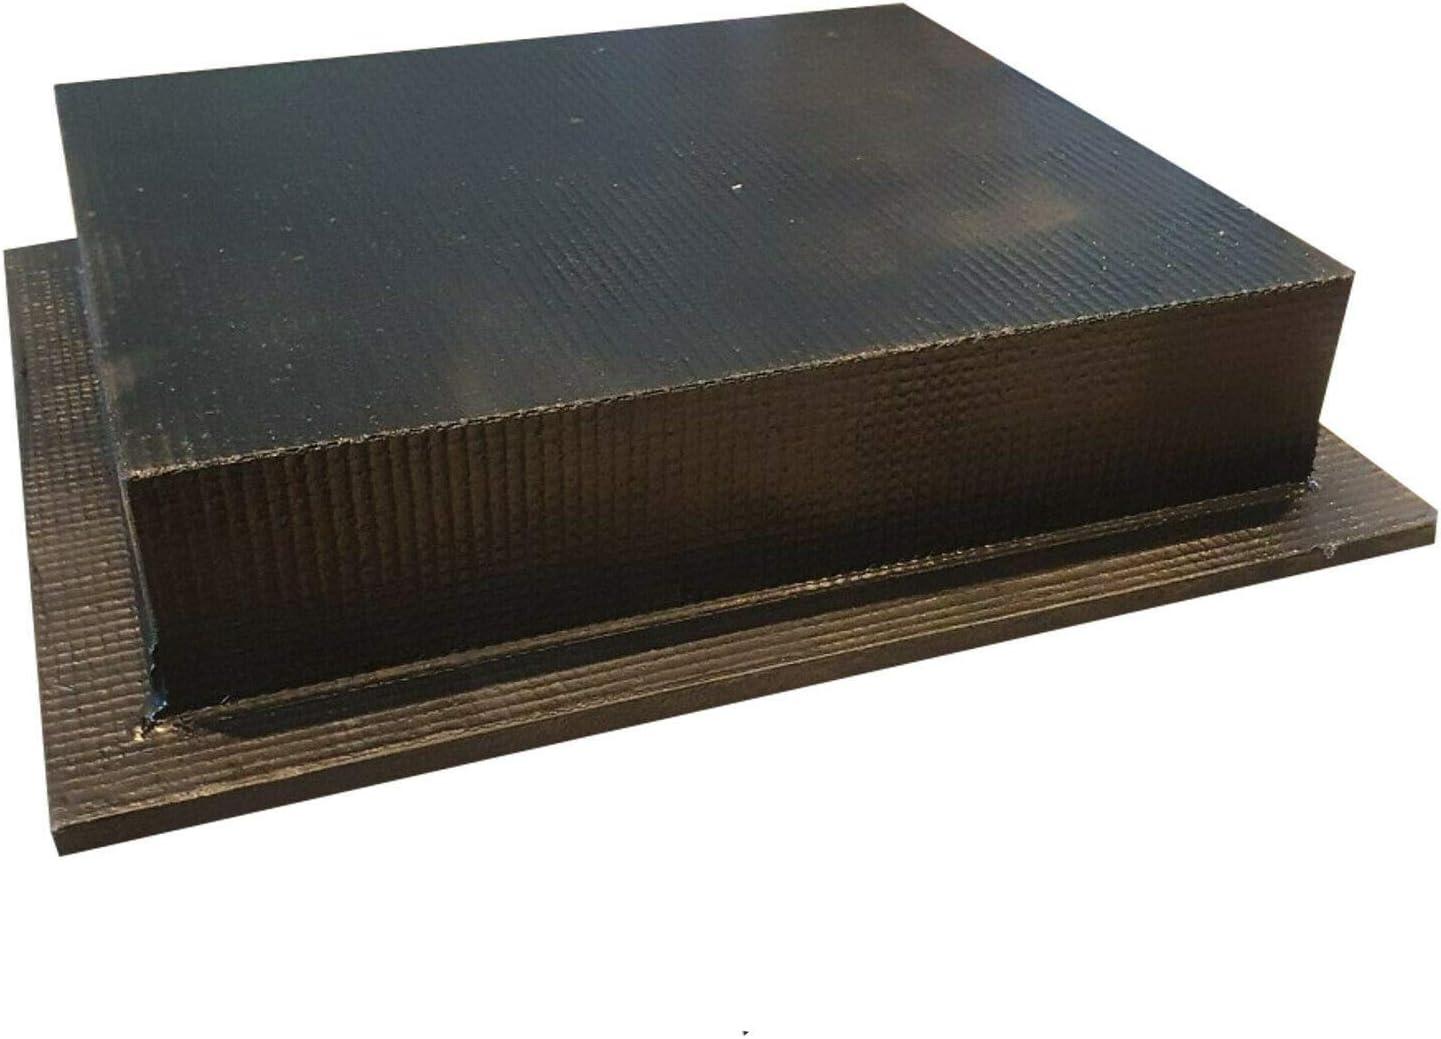 Tileable Shelf Pre-Built Lightweight 5m Tape Included Wet Room Alcove Recess Waterproof Storage Easy Installation for Home Improvement Bathroom Renovation Durable Nassboards Shower Niche